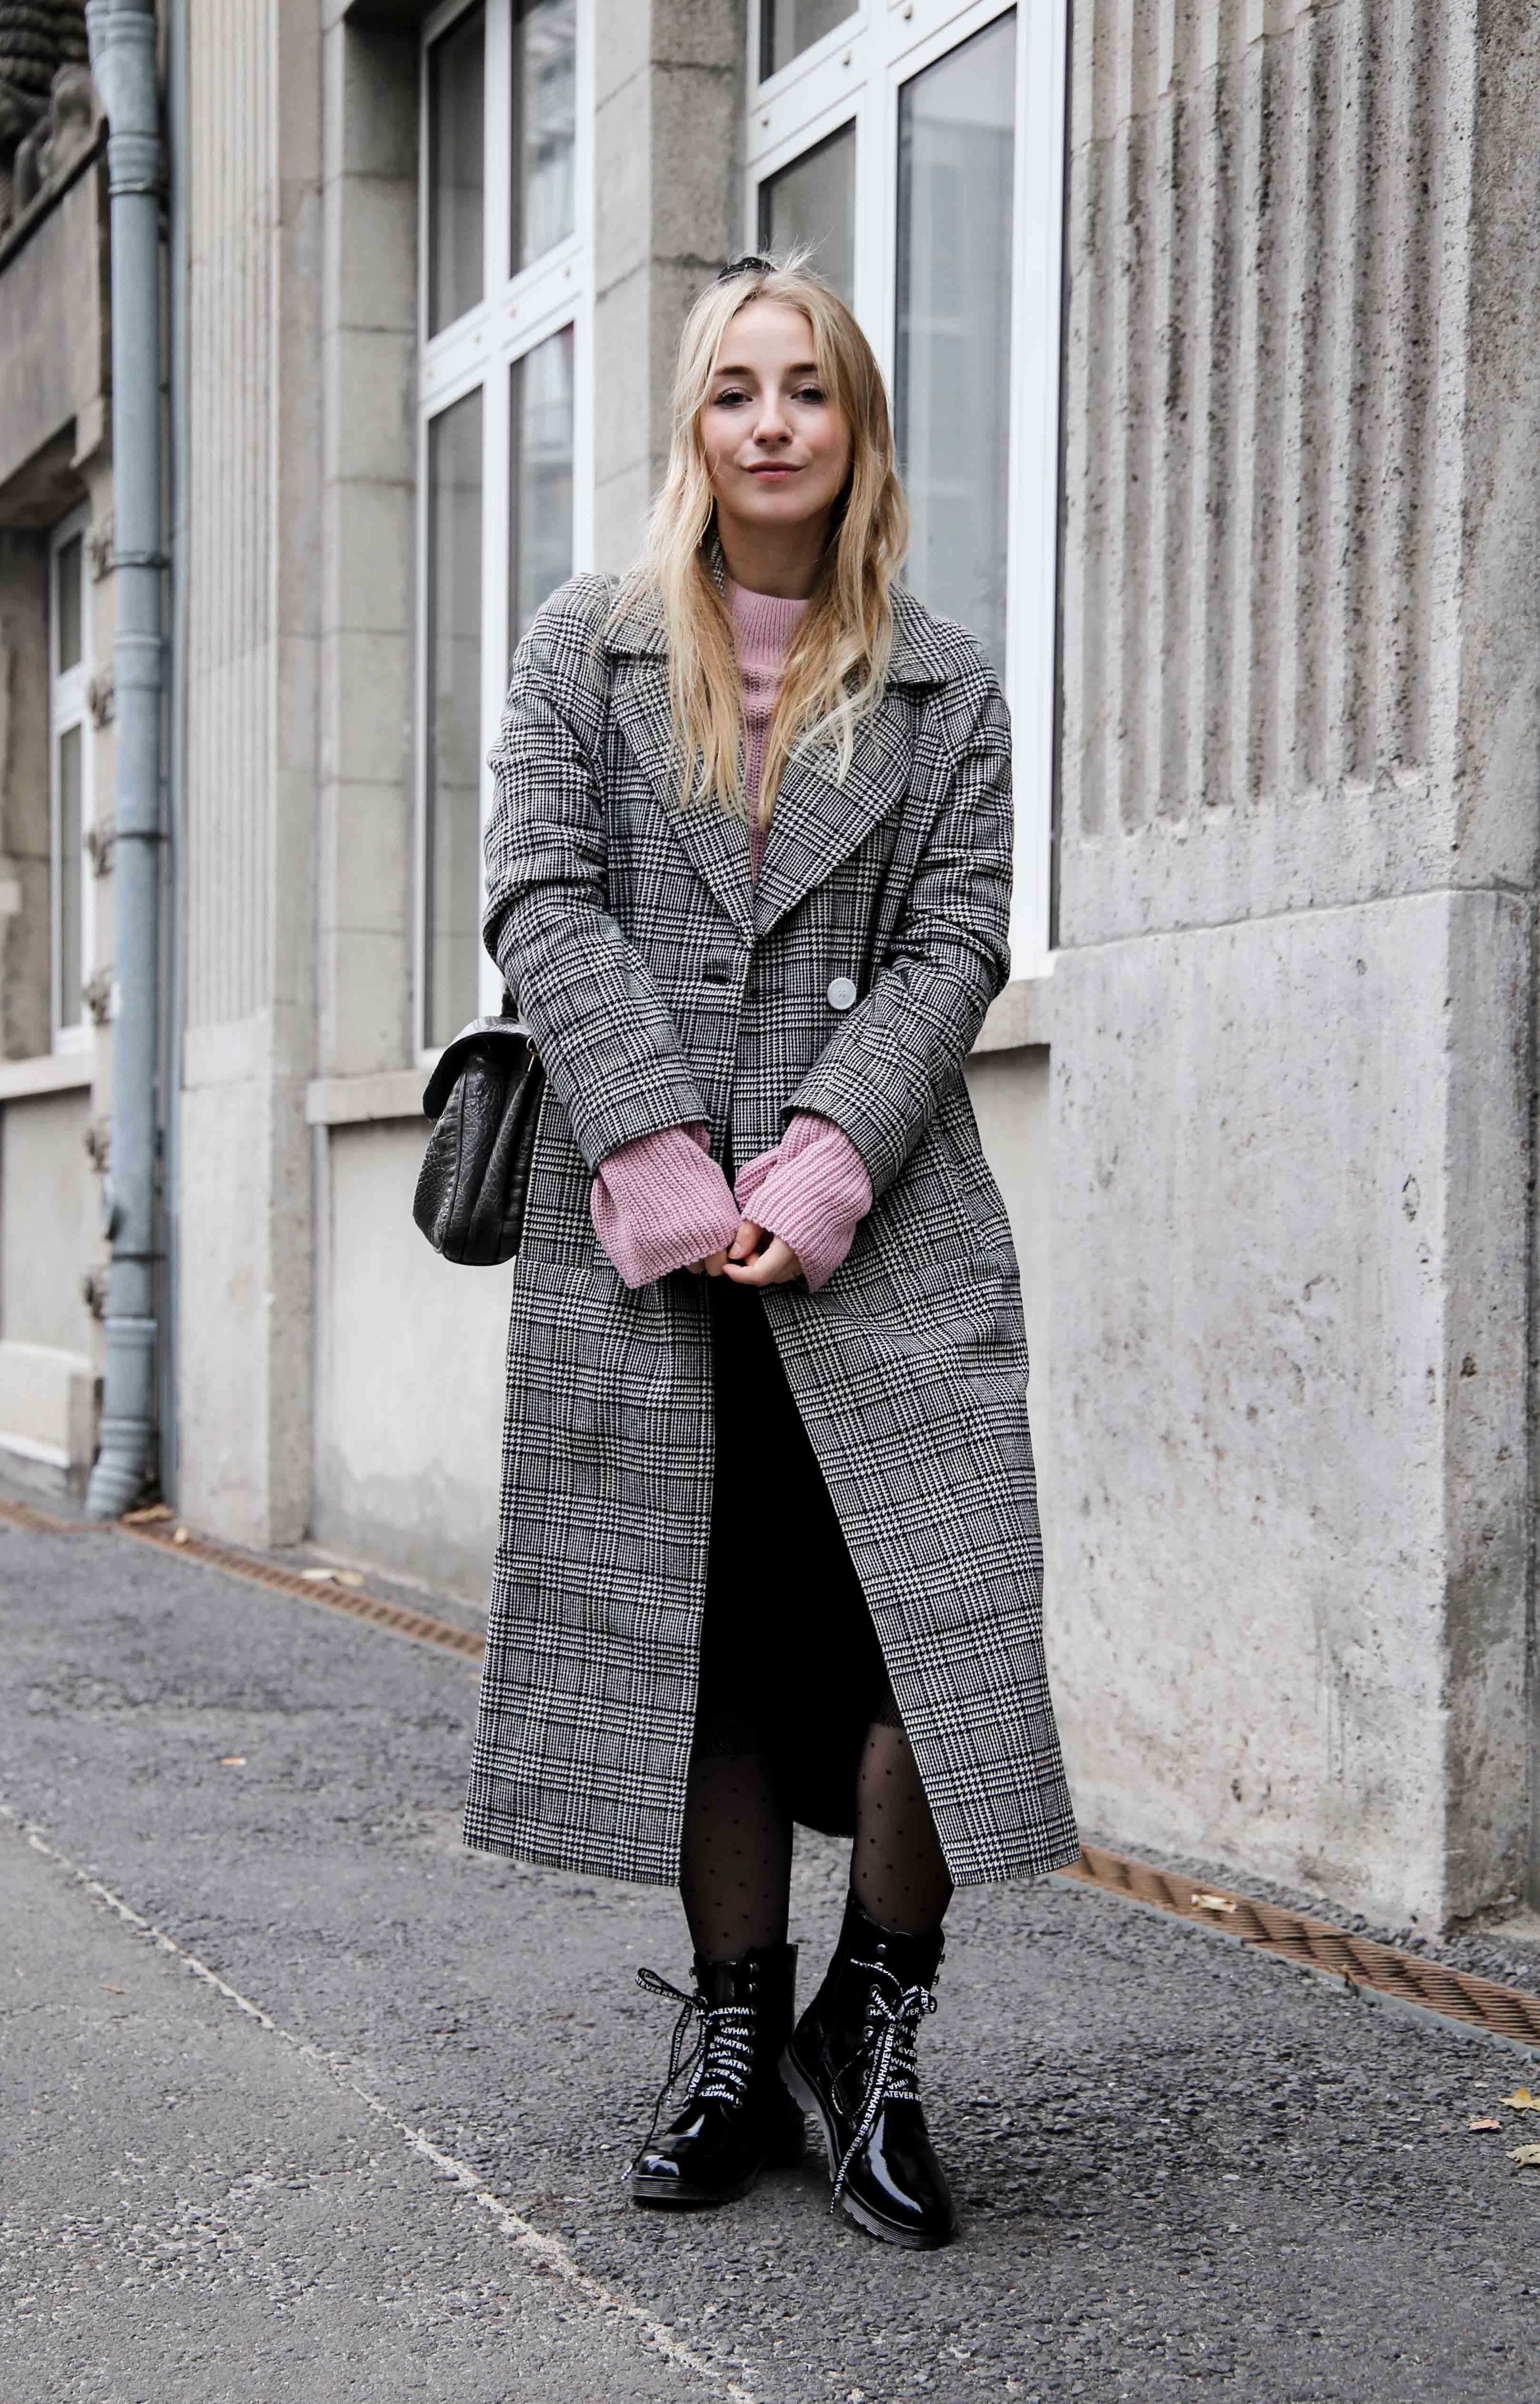 herbst-outfit-glencheck-muster-mantel-mode-blog-köln